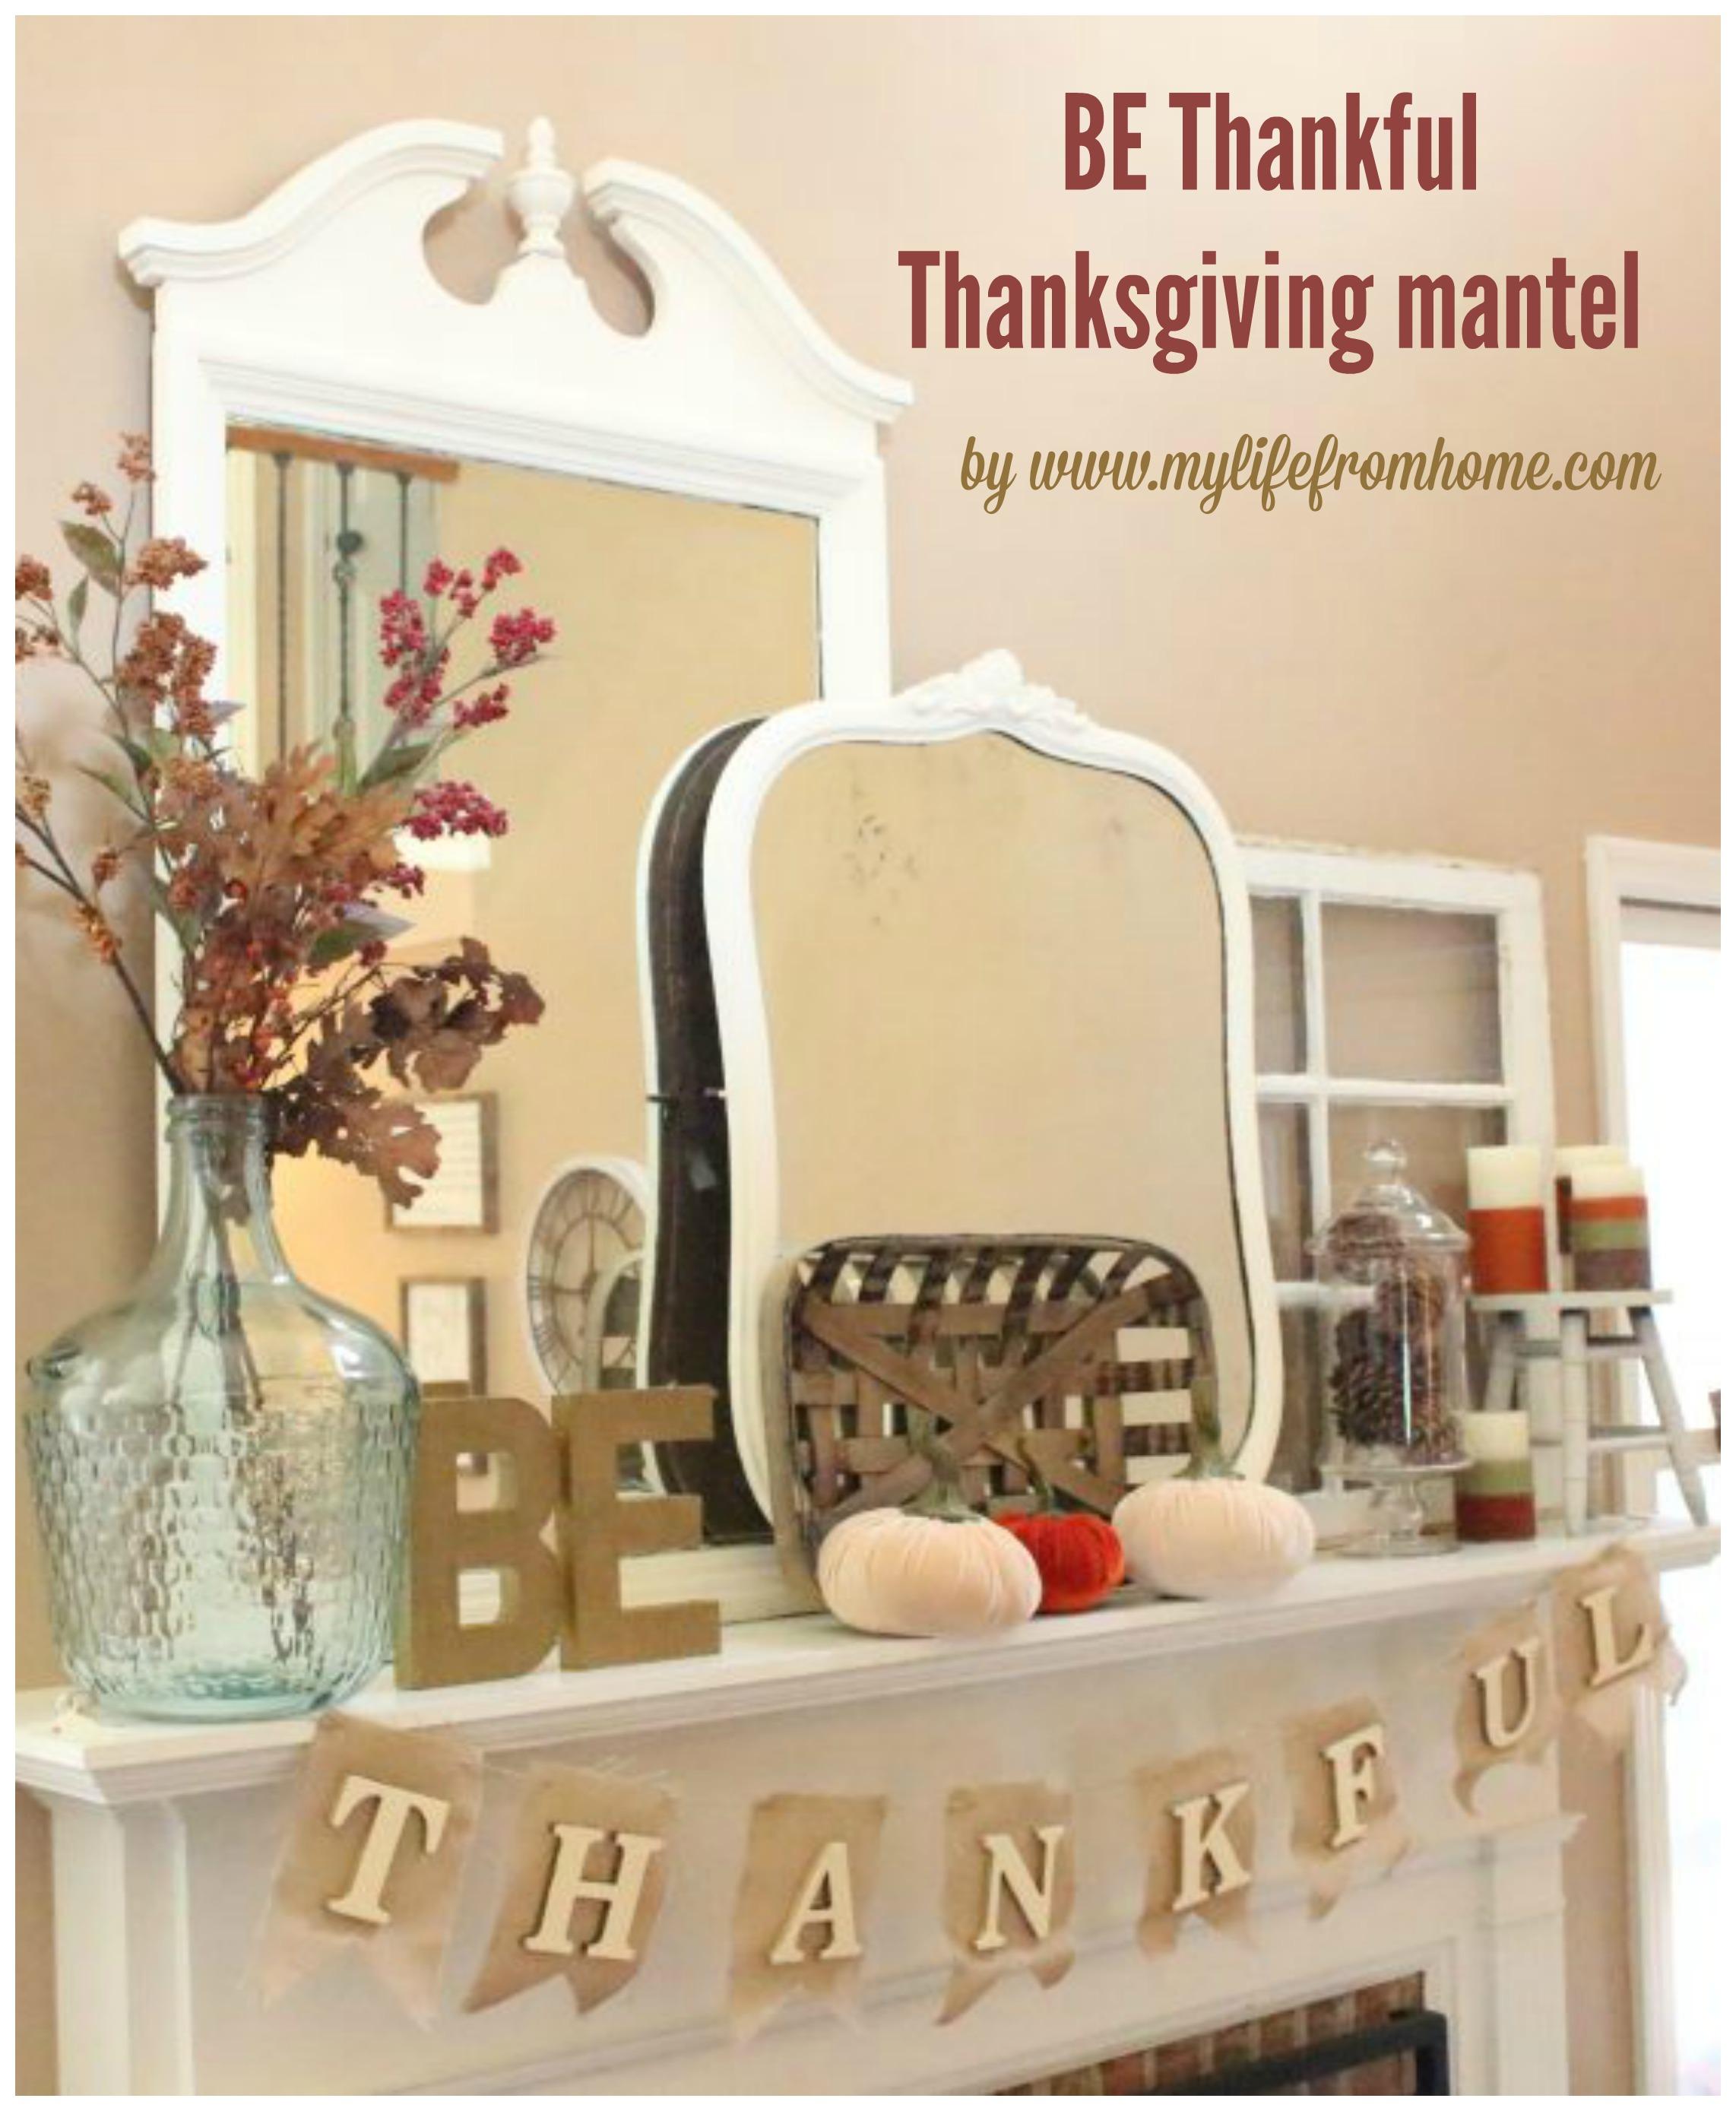 be-thankful-thanksgiving-mantel-seasonal-decorating-thanksgiving-mantel-decor-thanksgiving-mantel-mantle-fall-mantel-fall-autumn-decor-ideas-for-decorating-a-mantel-be-thankful-banner-diy-g